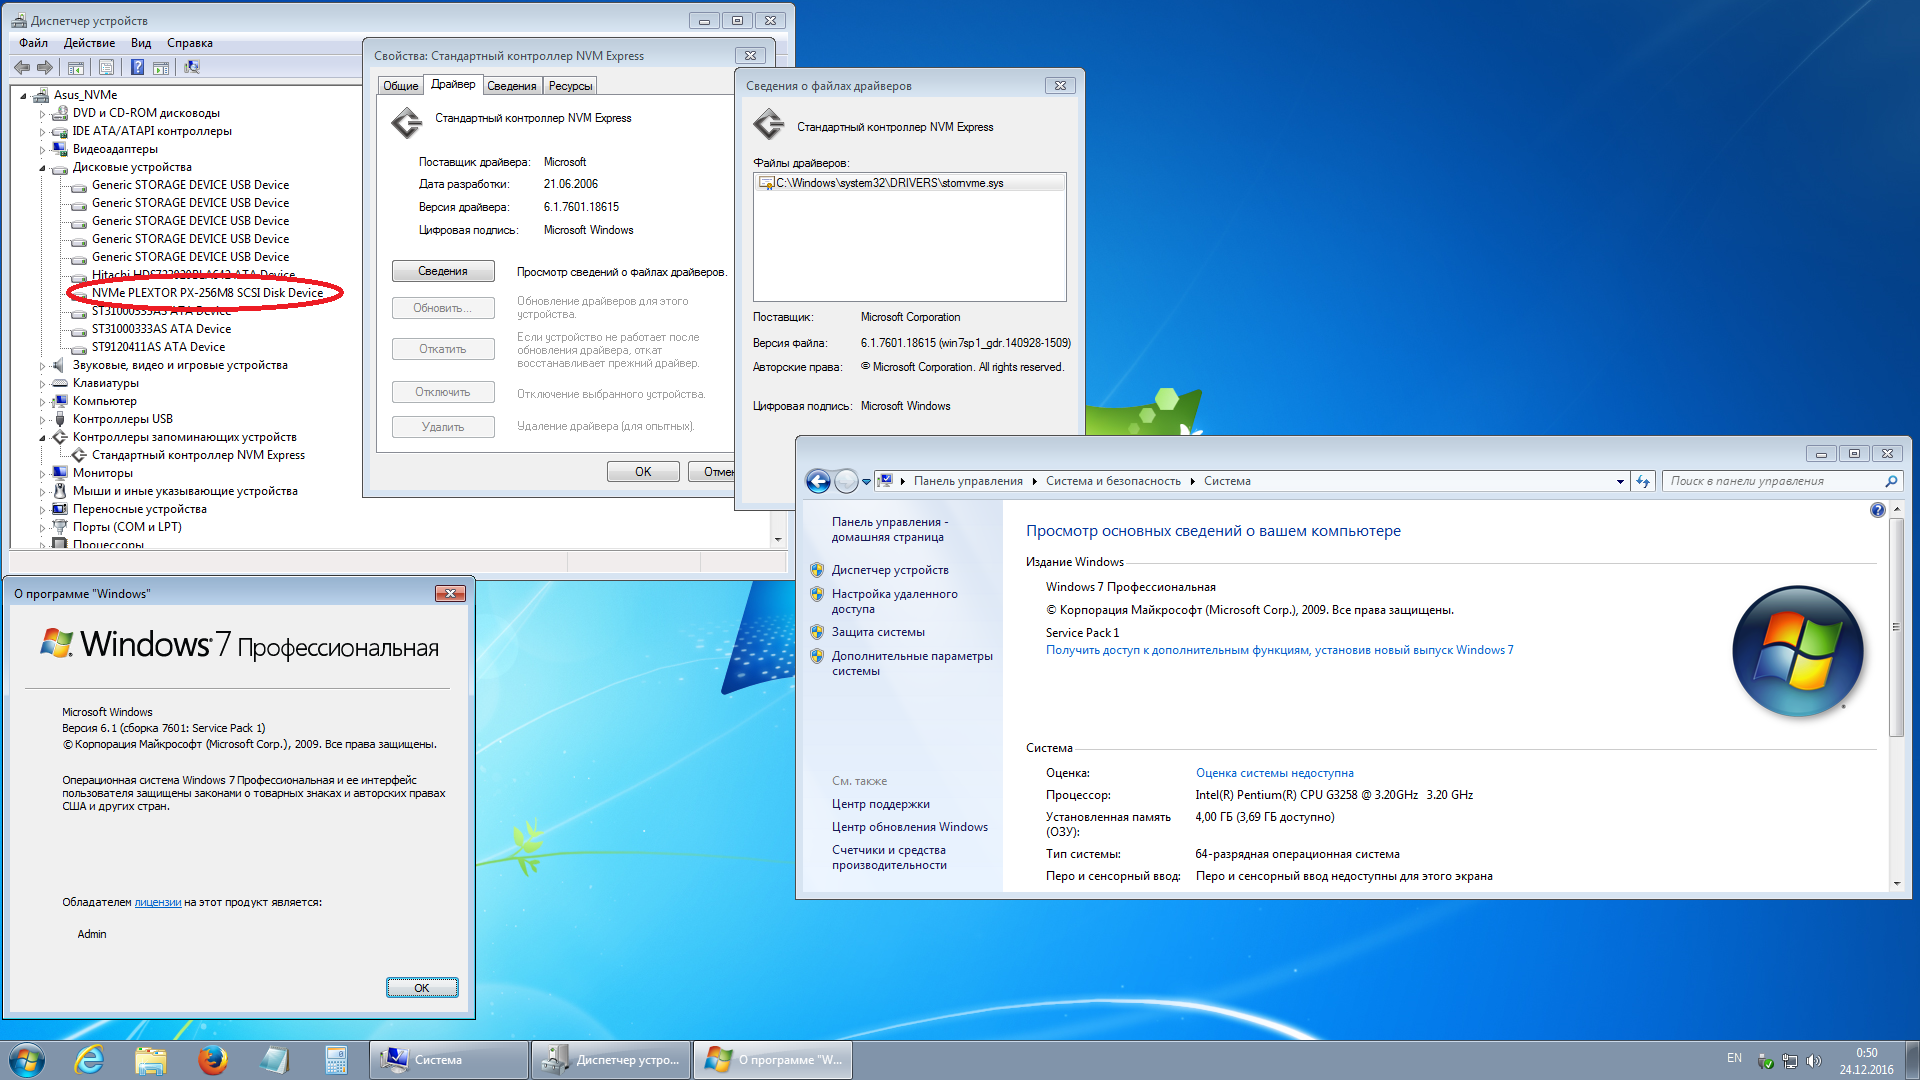 Windows 7 build 7100